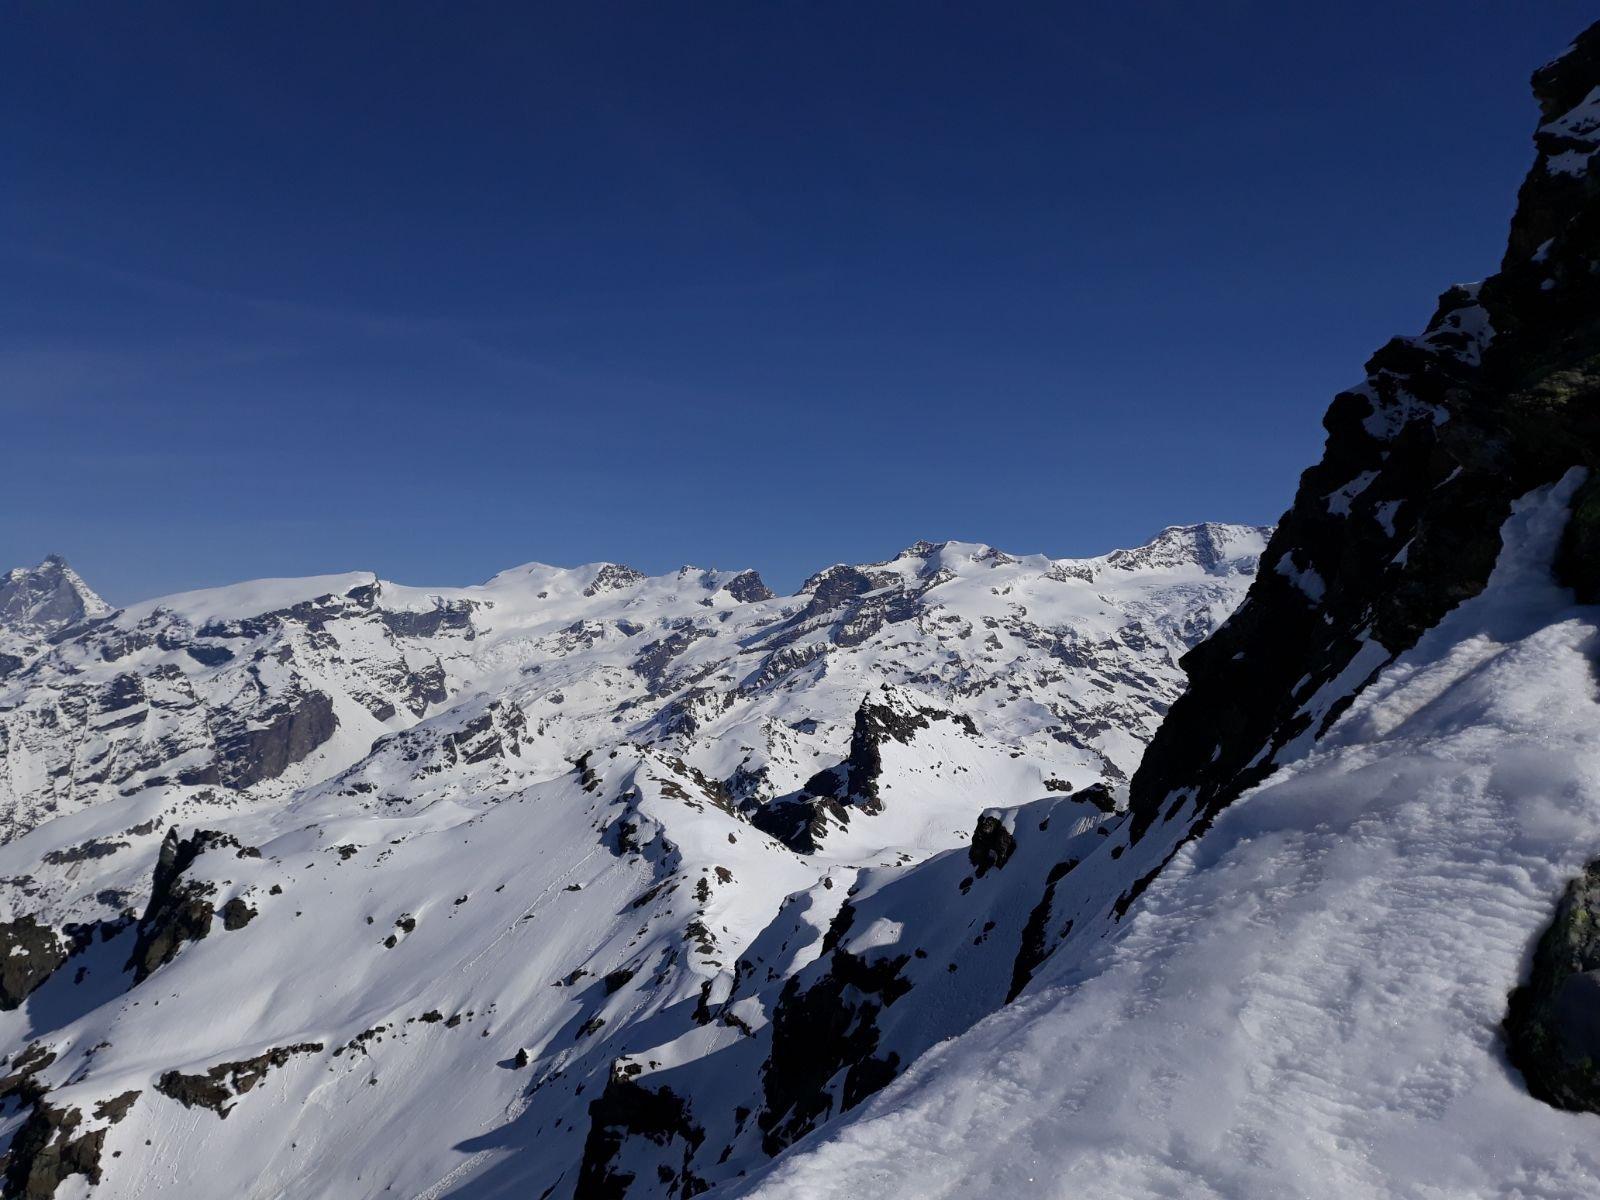 Panorama dal deposito sci